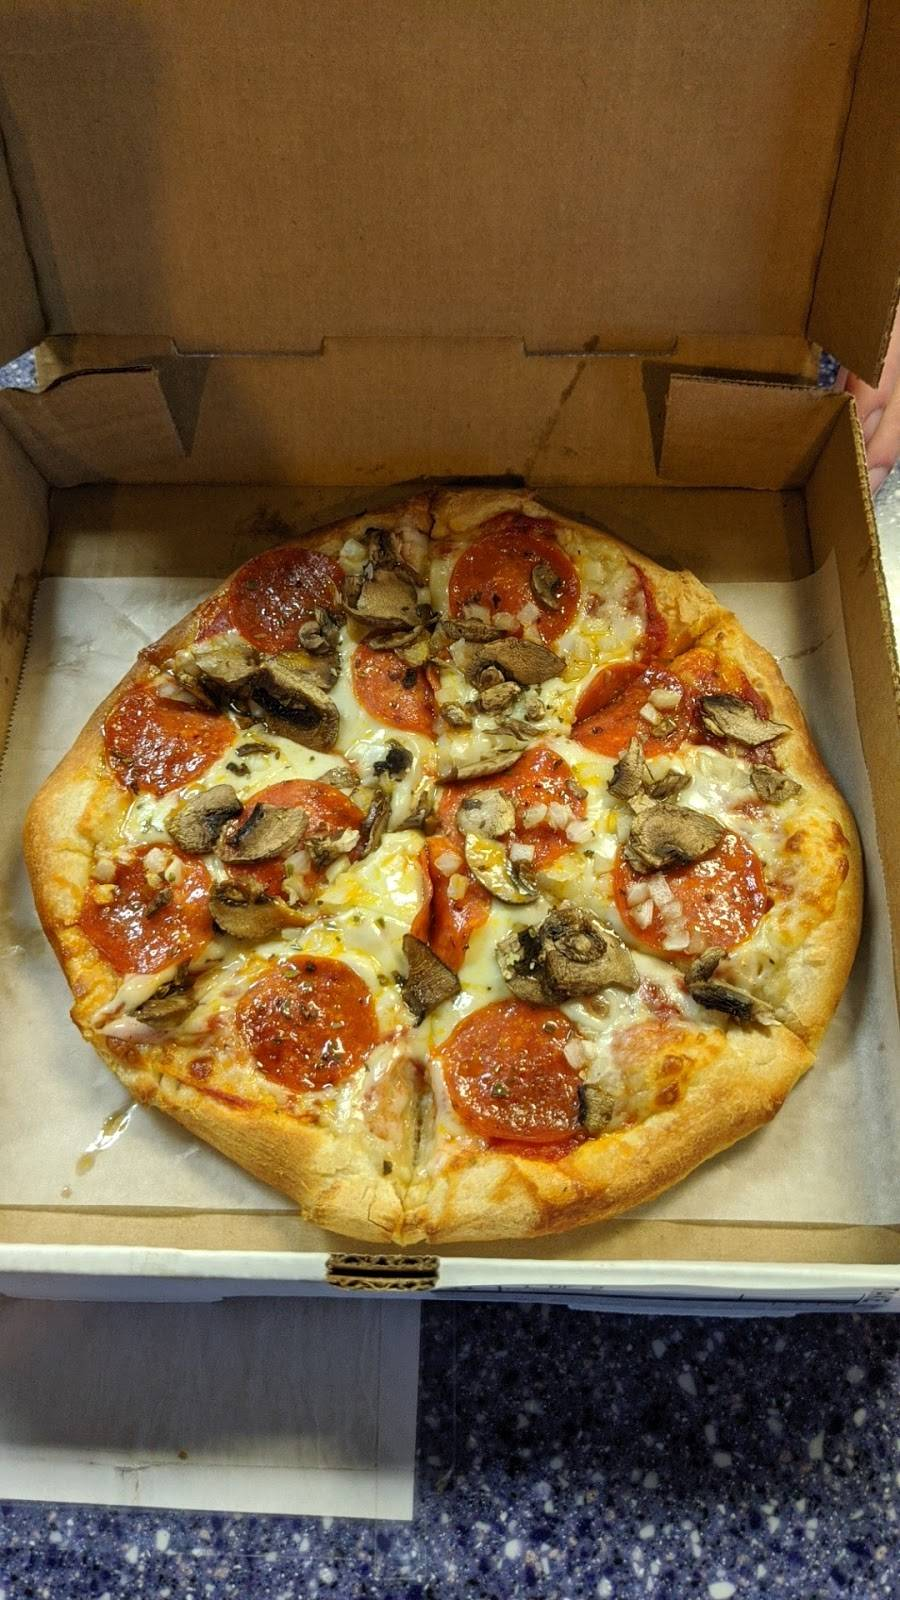 Moon Dog | restaurant | 1099 Old Berry Dr, Abingdon, VA 24210, USA | 2765251655 OR +1 276-525-1655